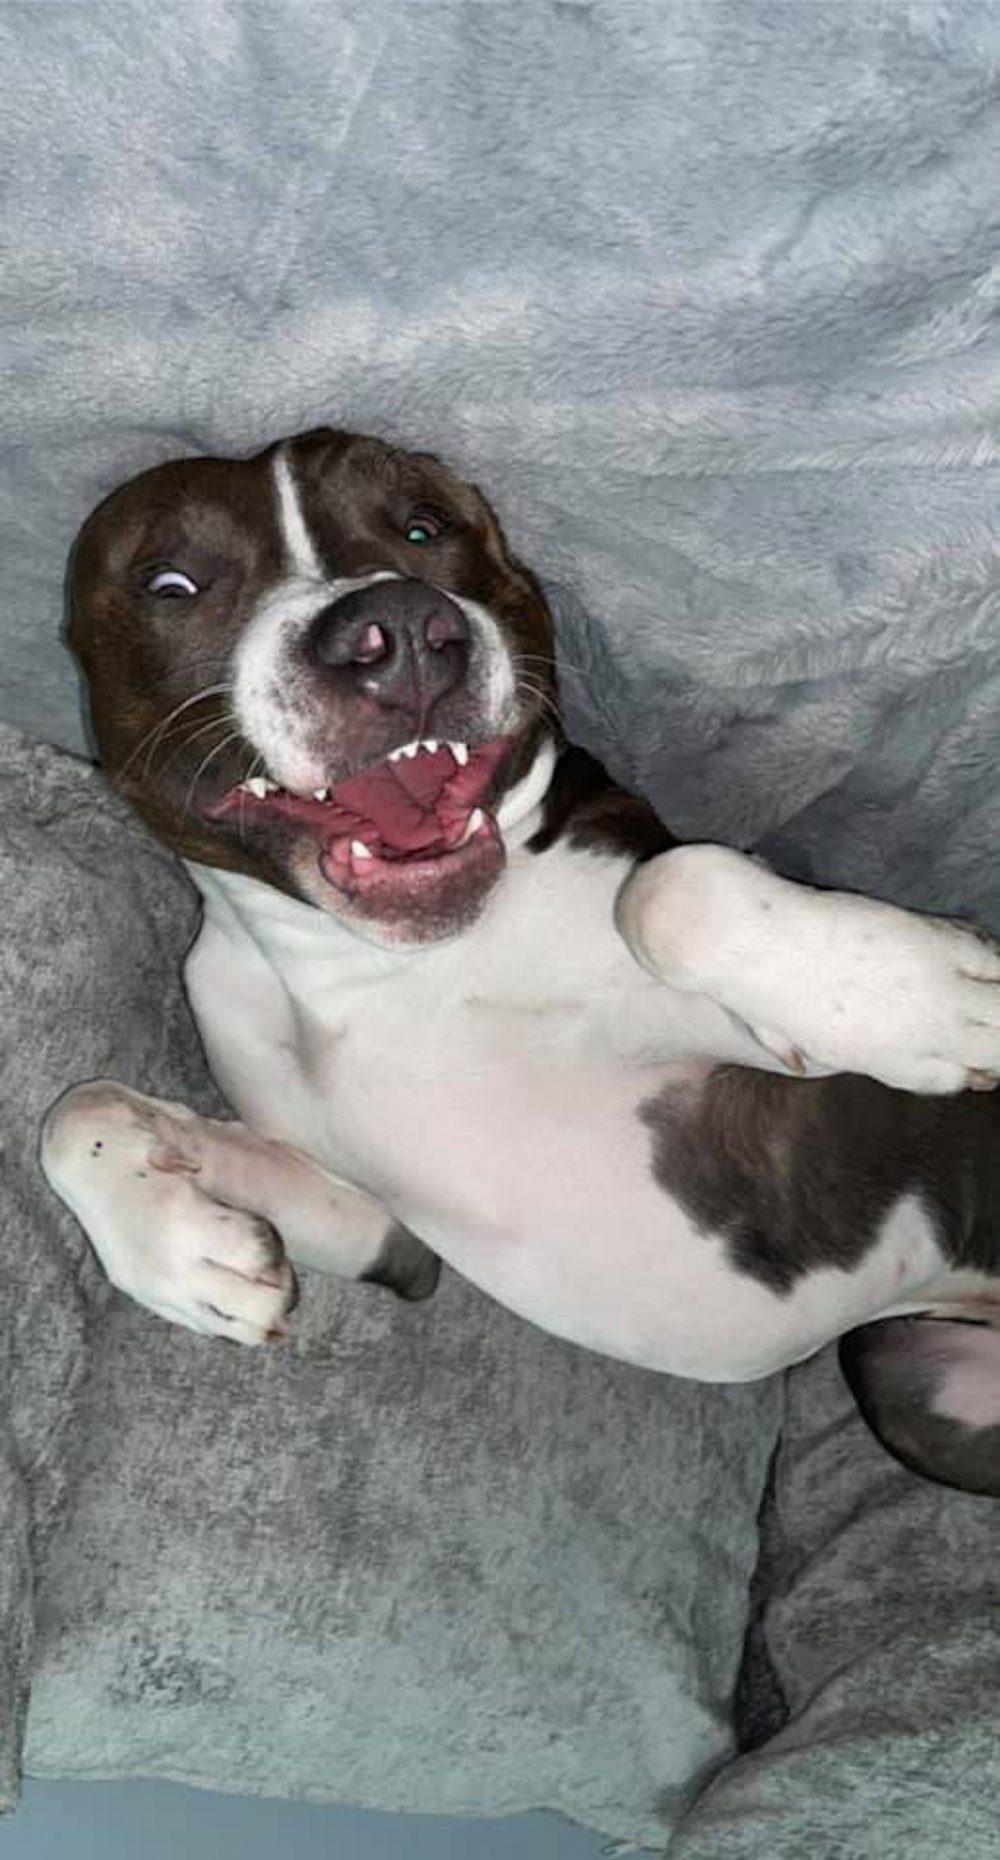 merican Staffordshire terrier Pablo - Viral News UK